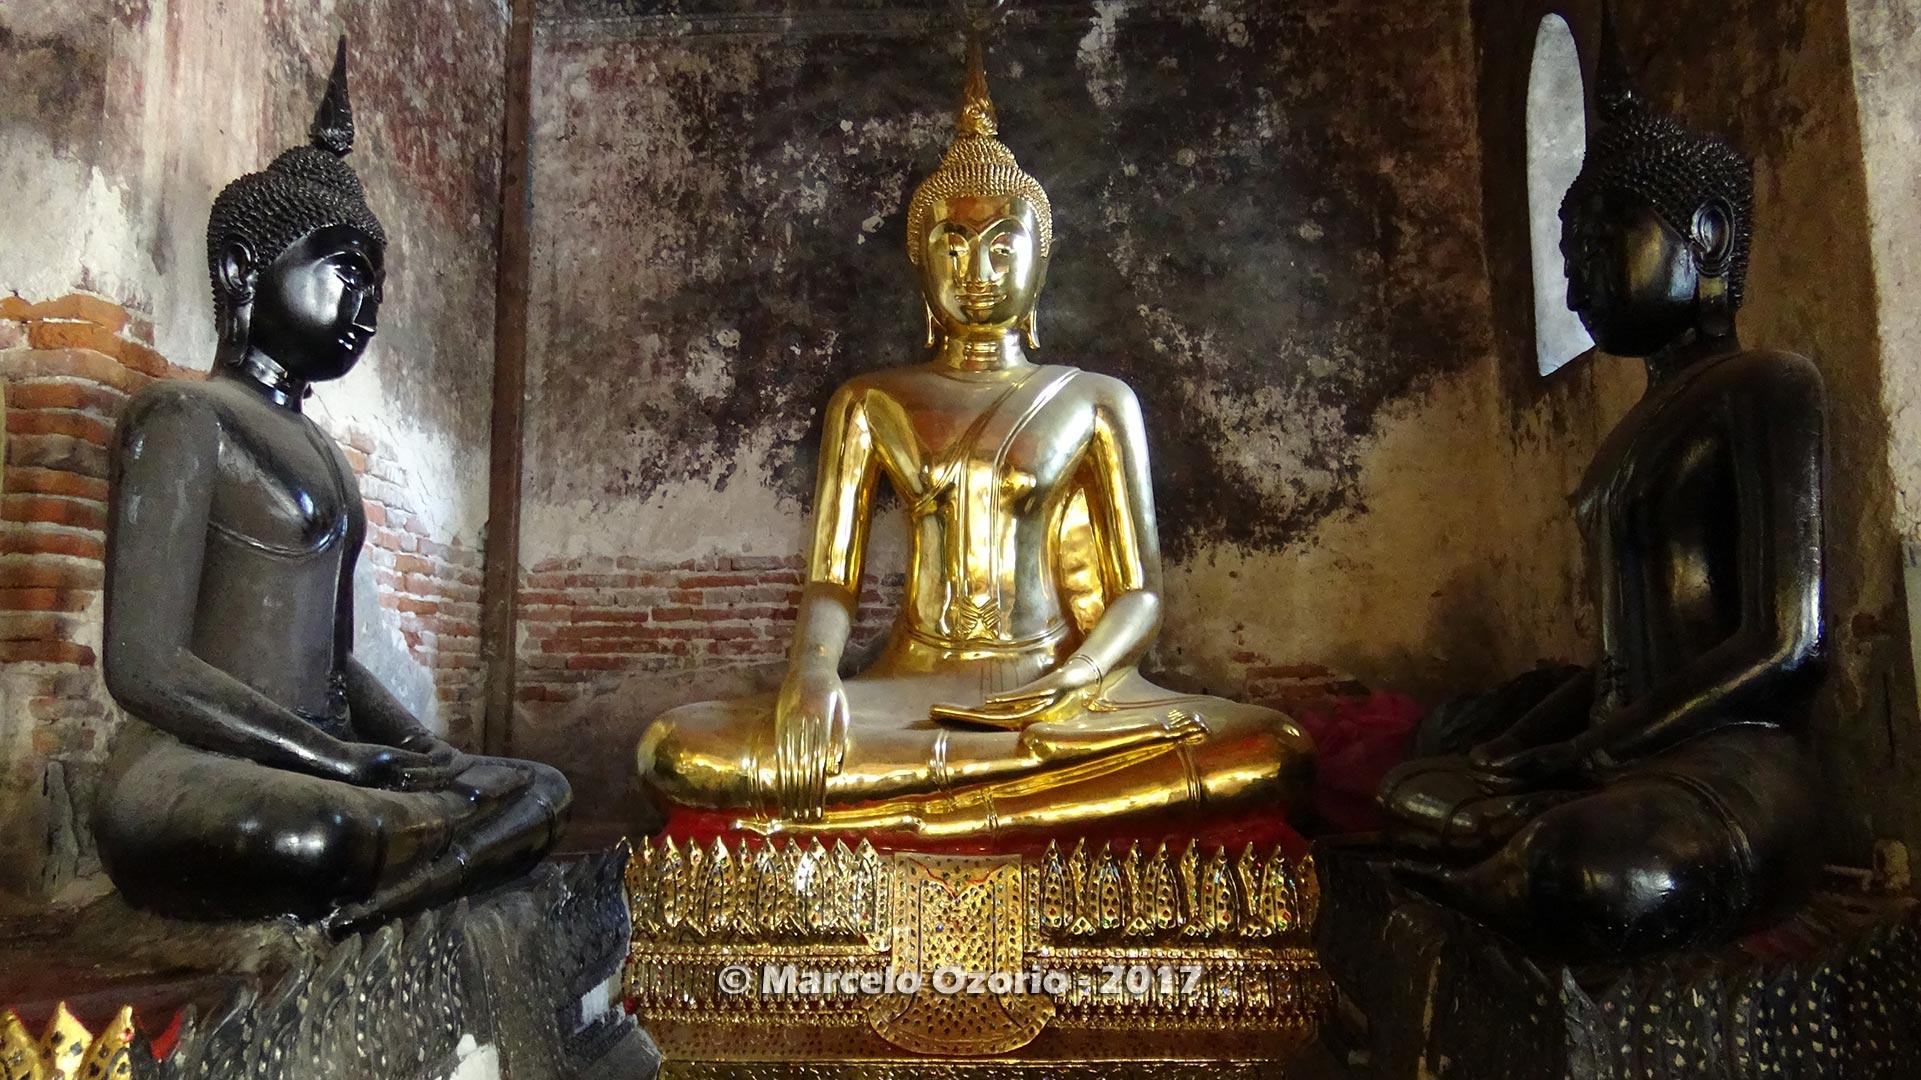 budhas bangkok thailand serie 3 - Buddhas of Bangkok - Thailand